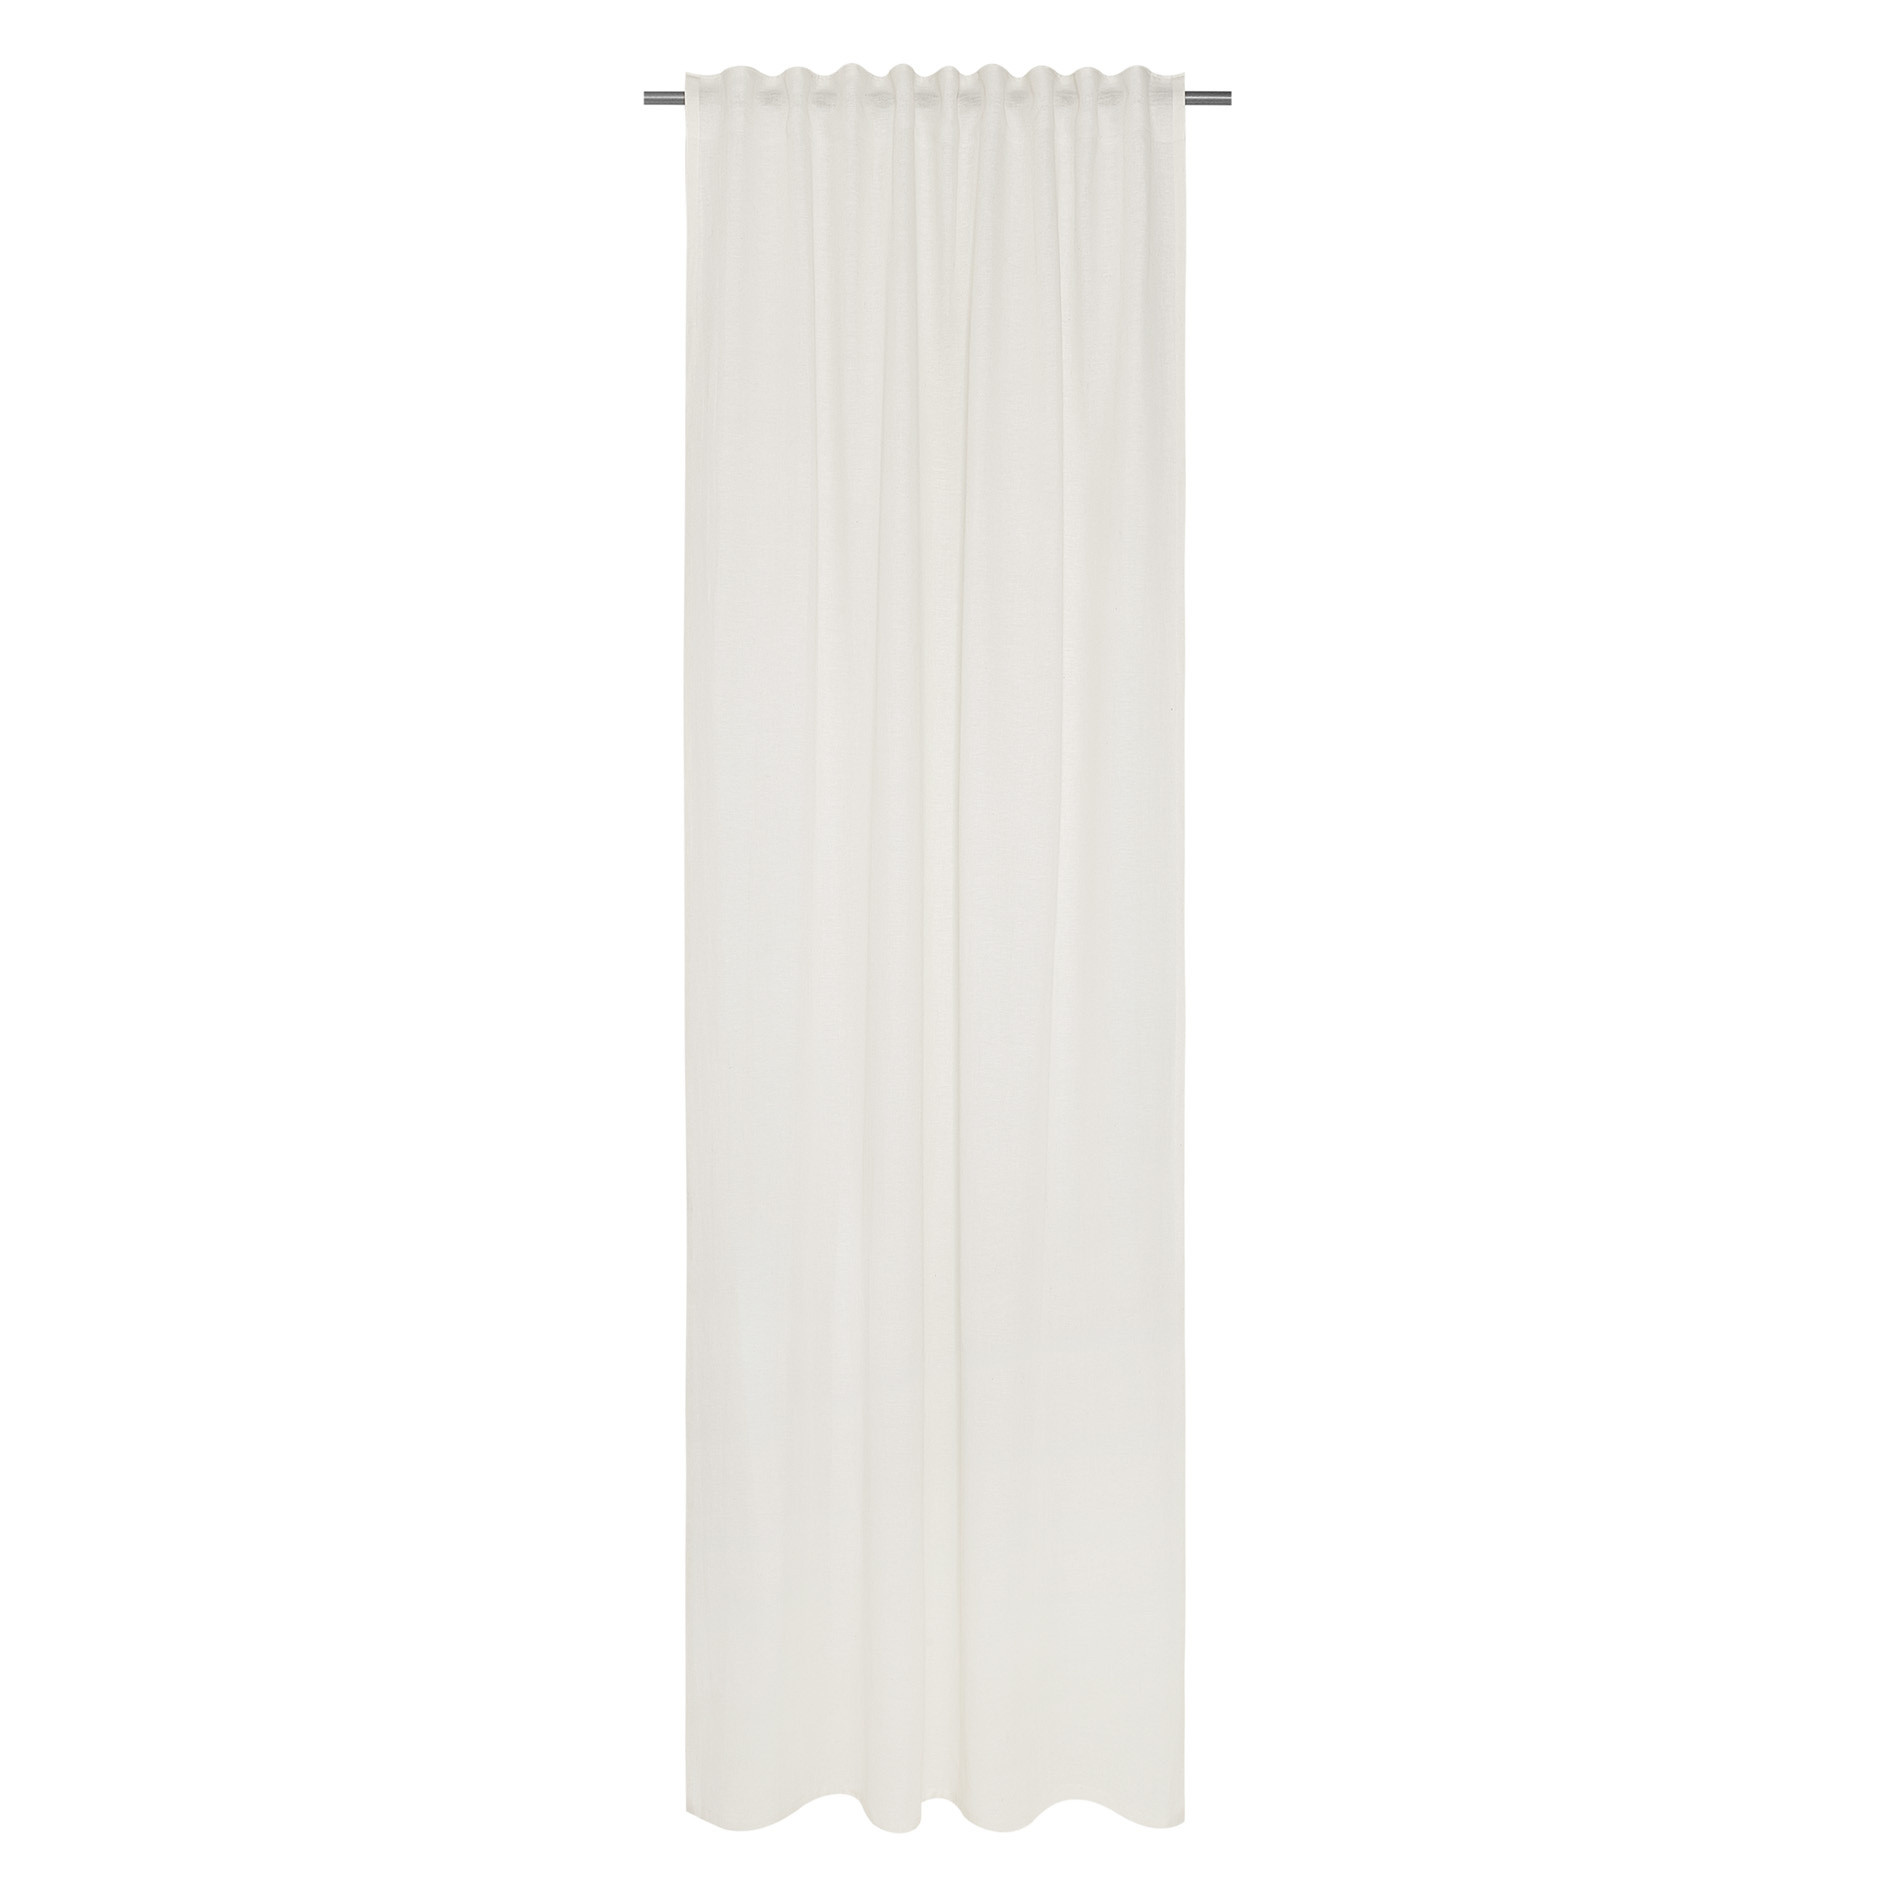 Tenda misto lino con passanti nascosti, Bianco, large image number 1